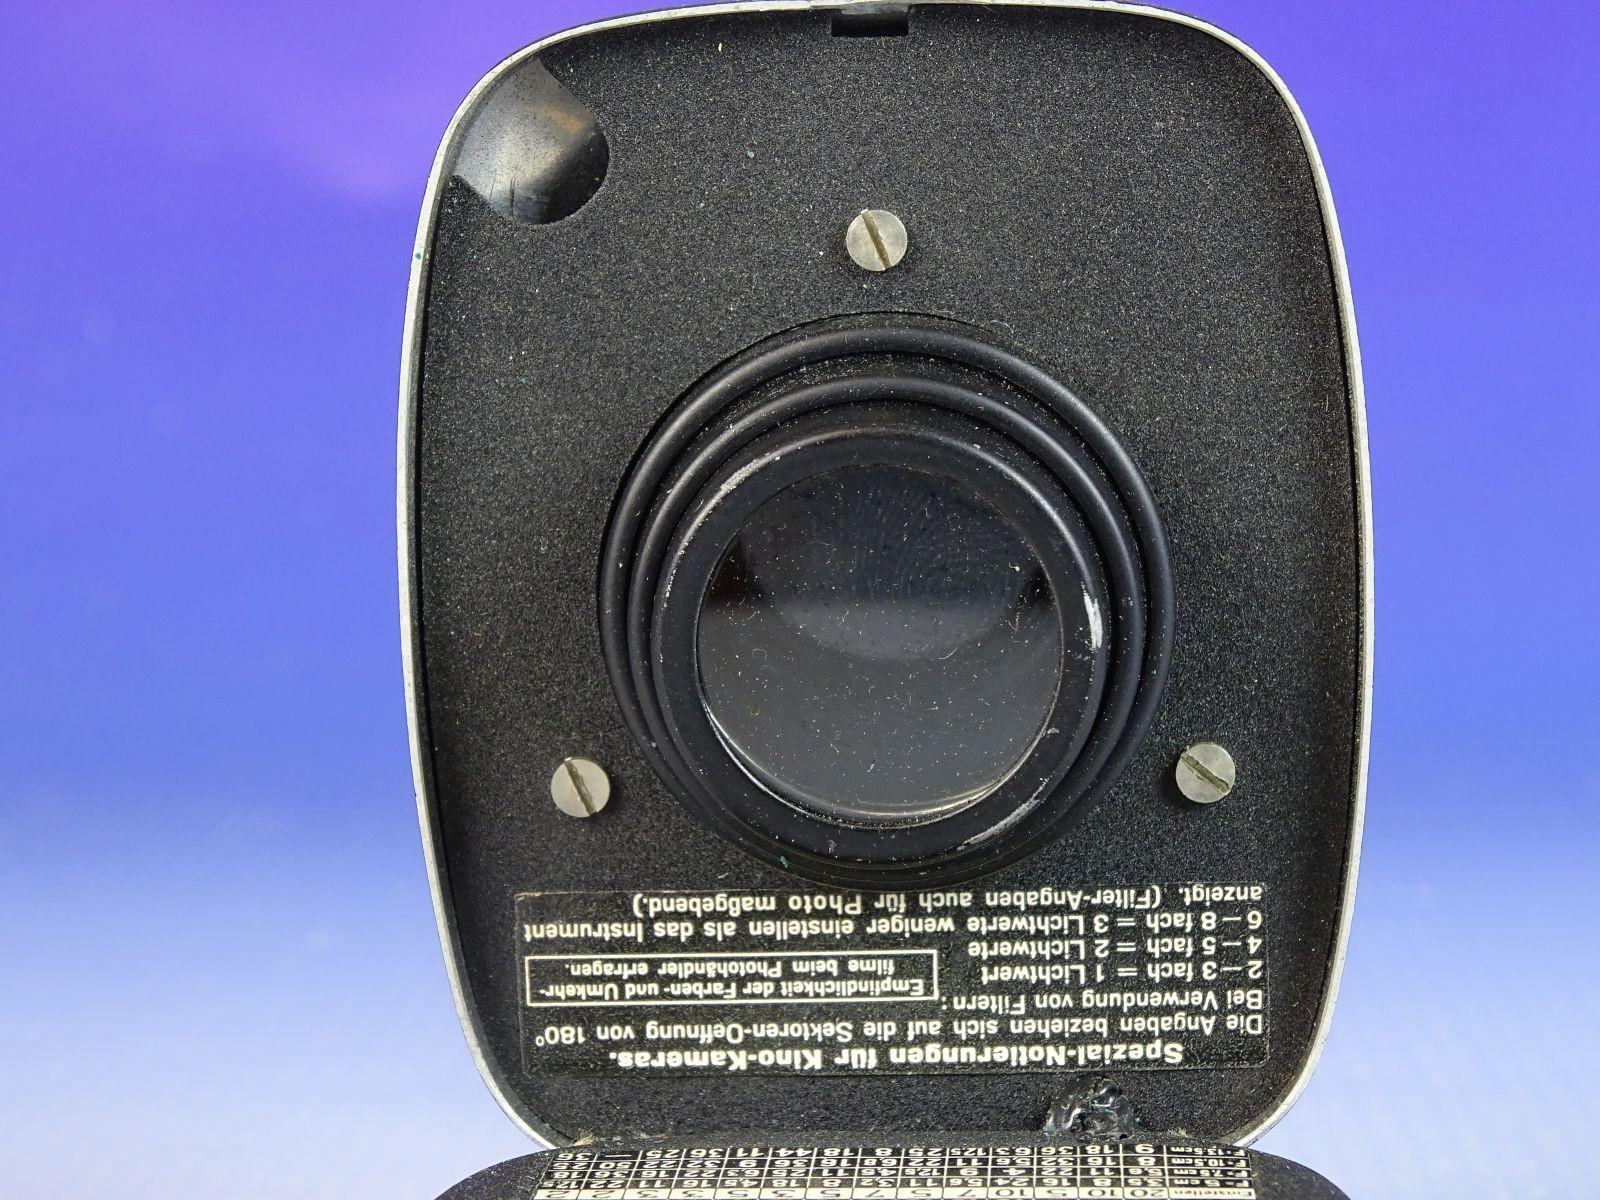 DSC06463.JPG (1600×1200)